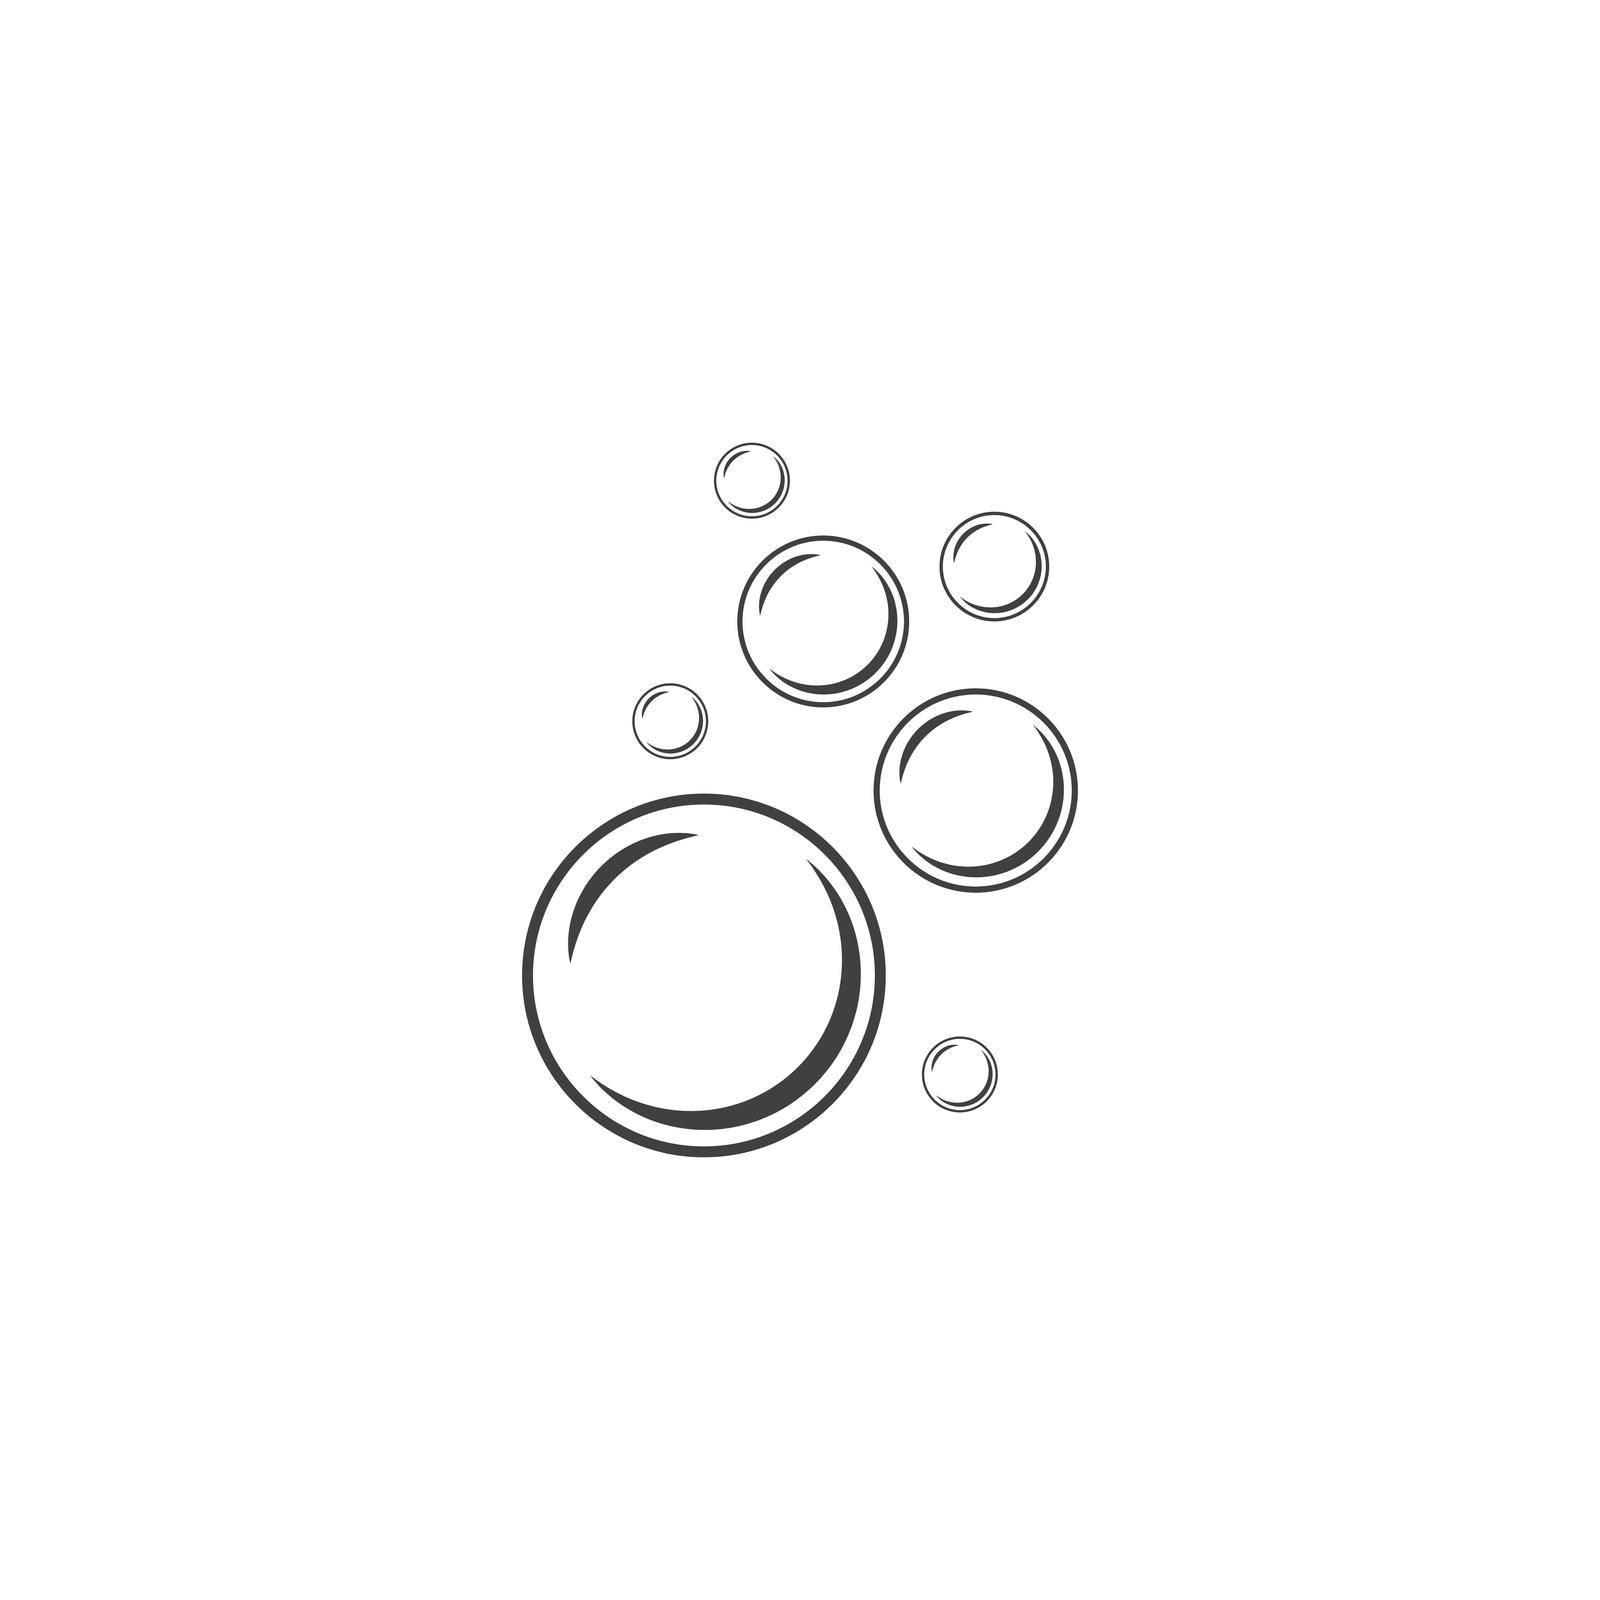 Natural realistic water bubble illustration vector design